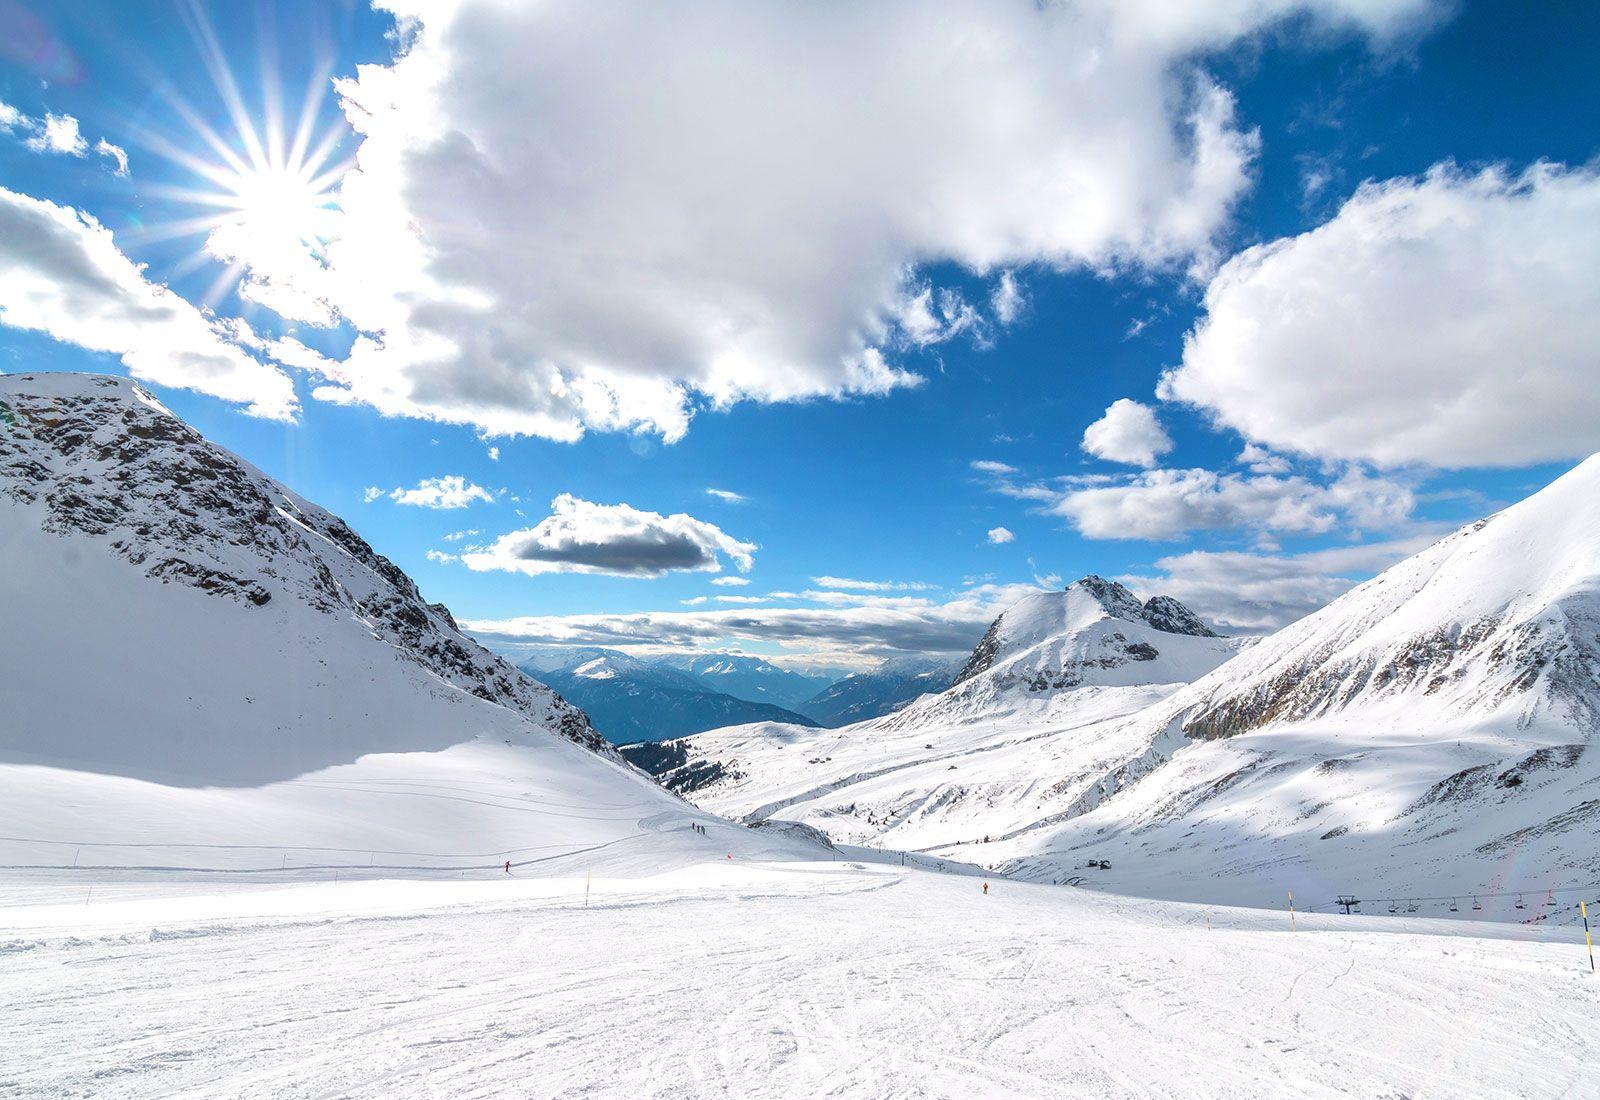 Snowy mountains landscape